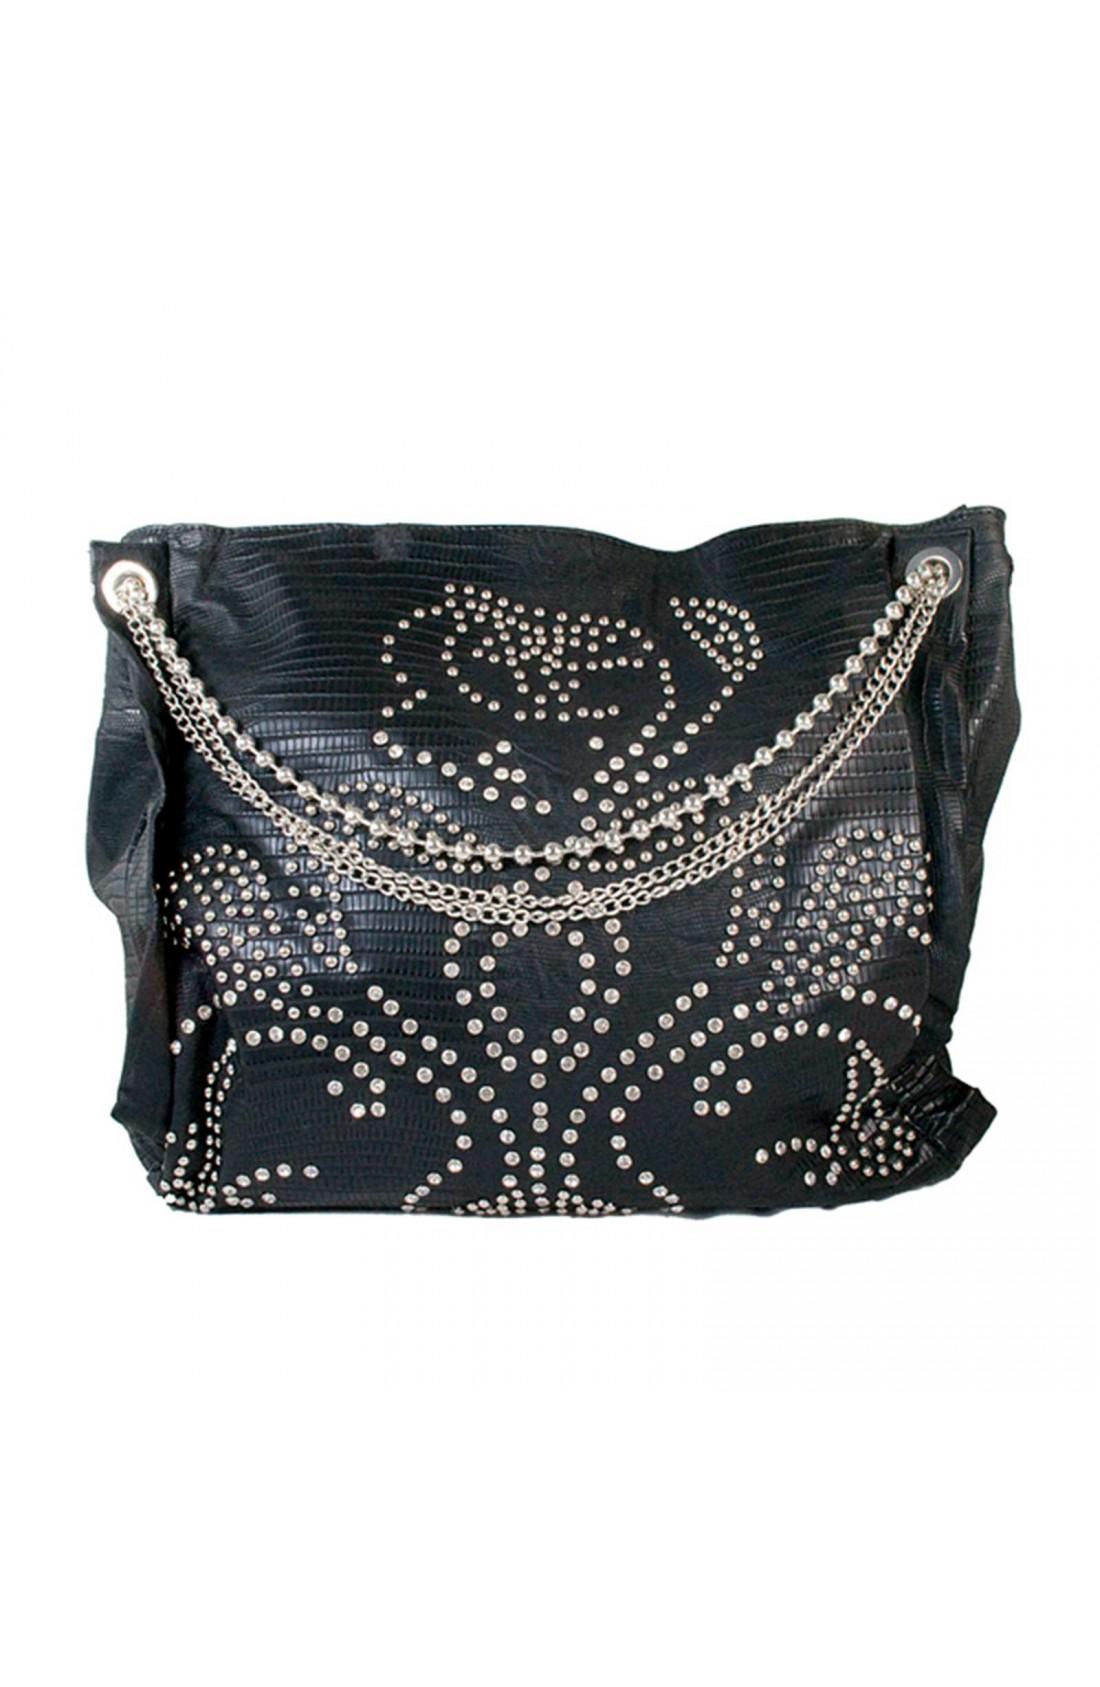 WONDER Fashion Women's Black PU Bag with Studs and Diamantes